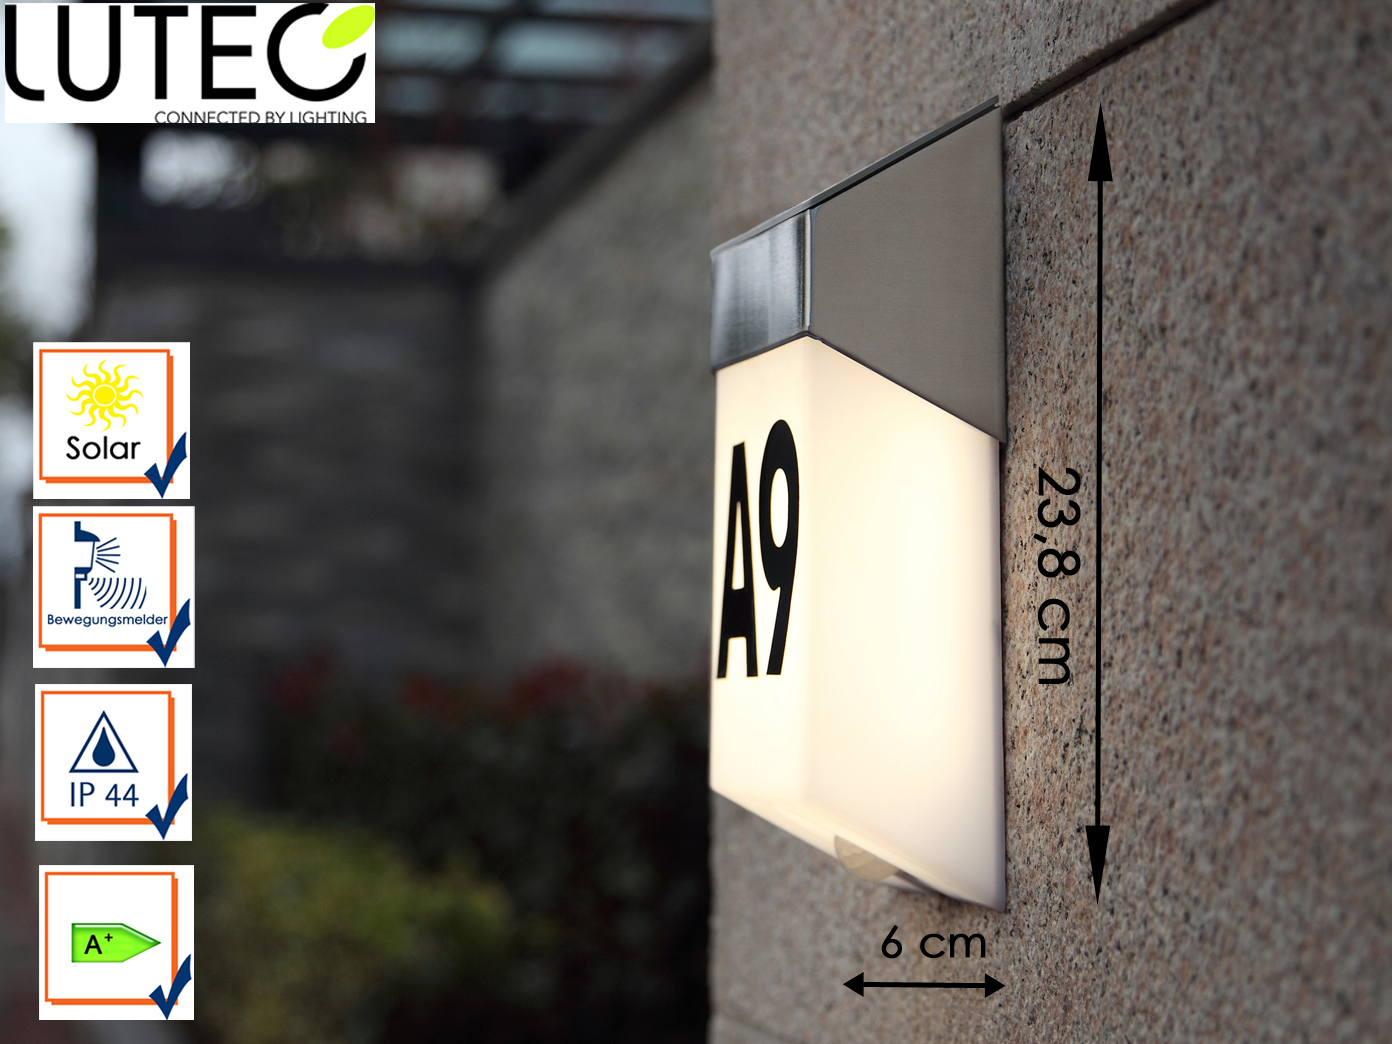 LED-Ausenwandleuchte-mit-Solar-Bewegungsmelder-Hausnummern-IP44-Wandleuchten miniatura 5